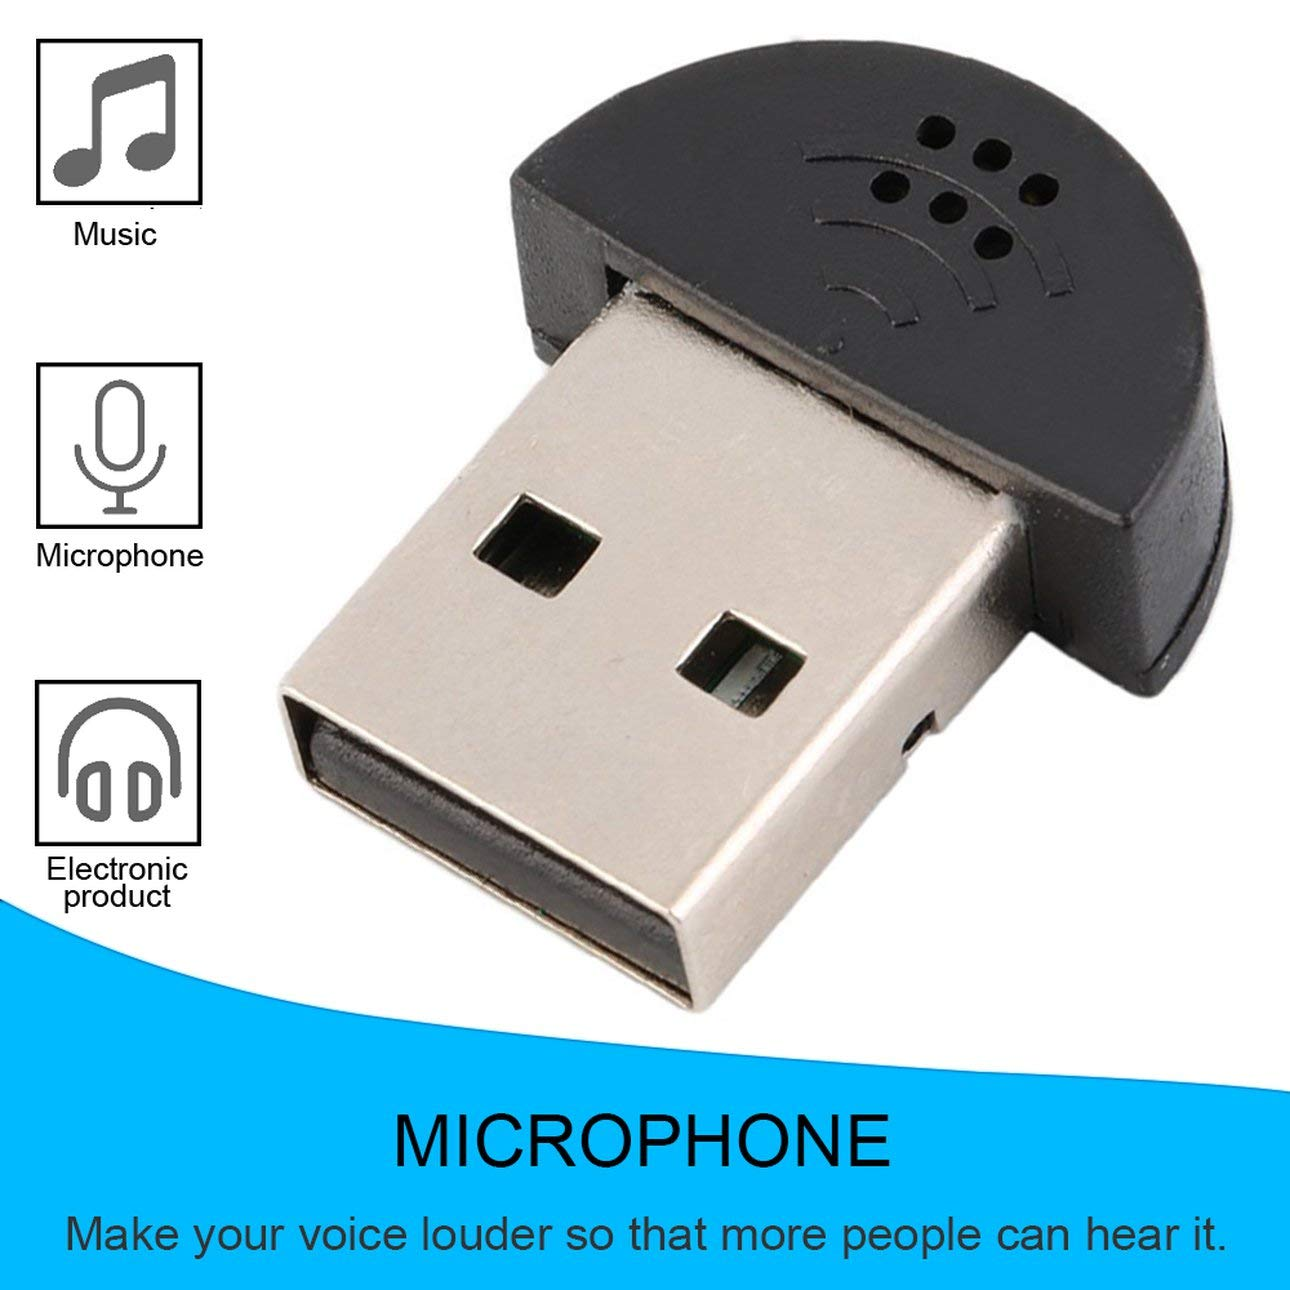 Ballylelly Super USB Mini Leichtgewicht USB 2.0 Mikrofon MIC Audio Adapter 100-16kHz f/ür PC Notebook Laptopest